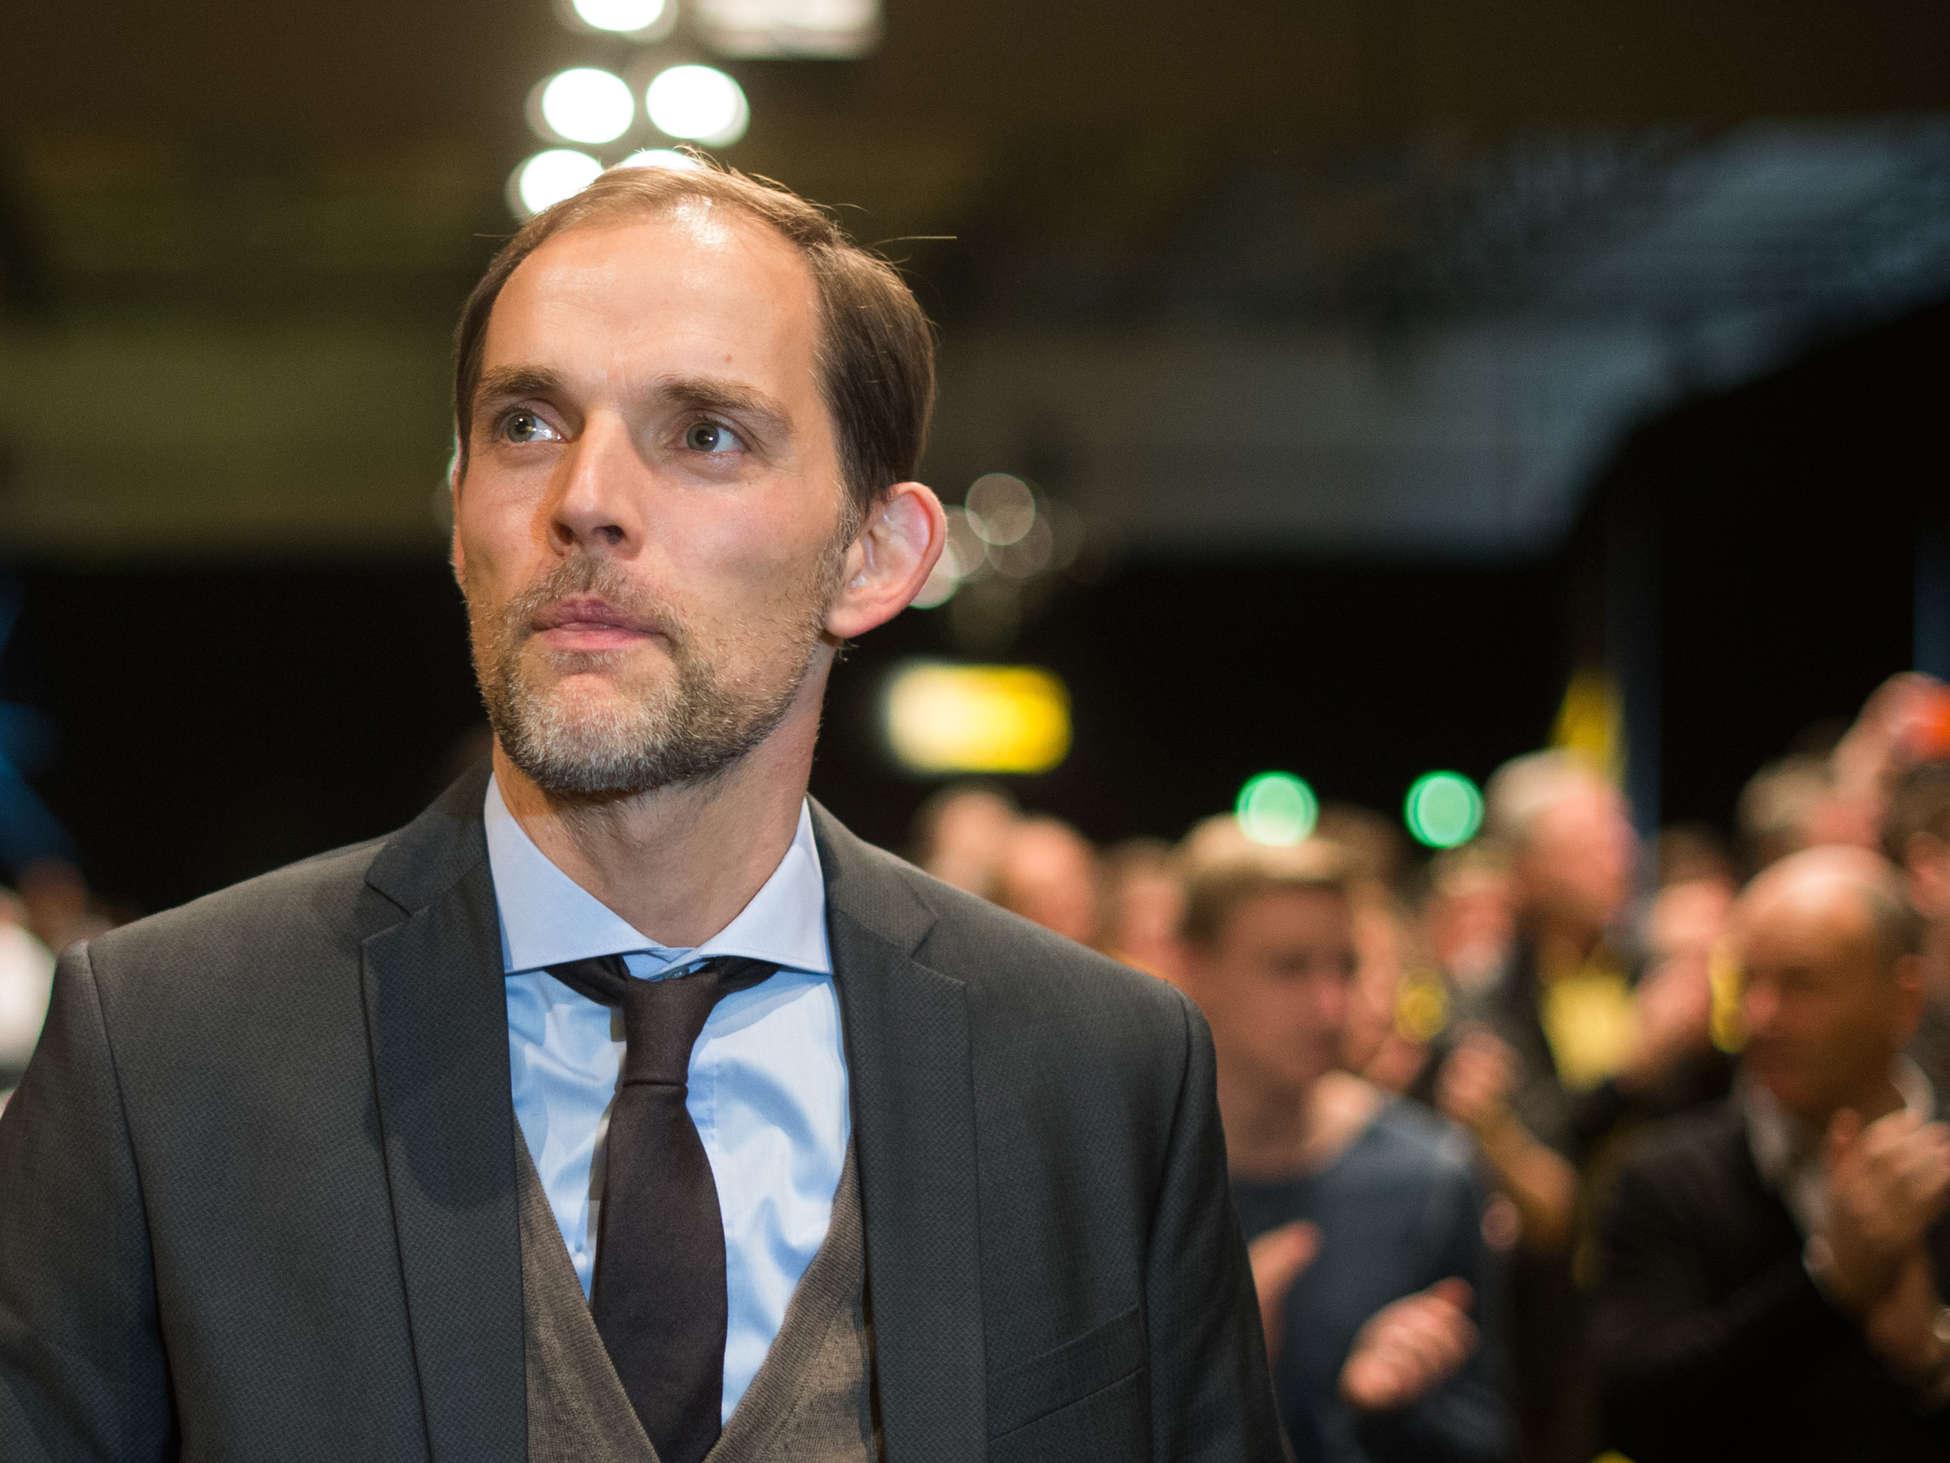 CHÍNH THỨC: PSG bổ nhiệm HLV Thomas Tuchel